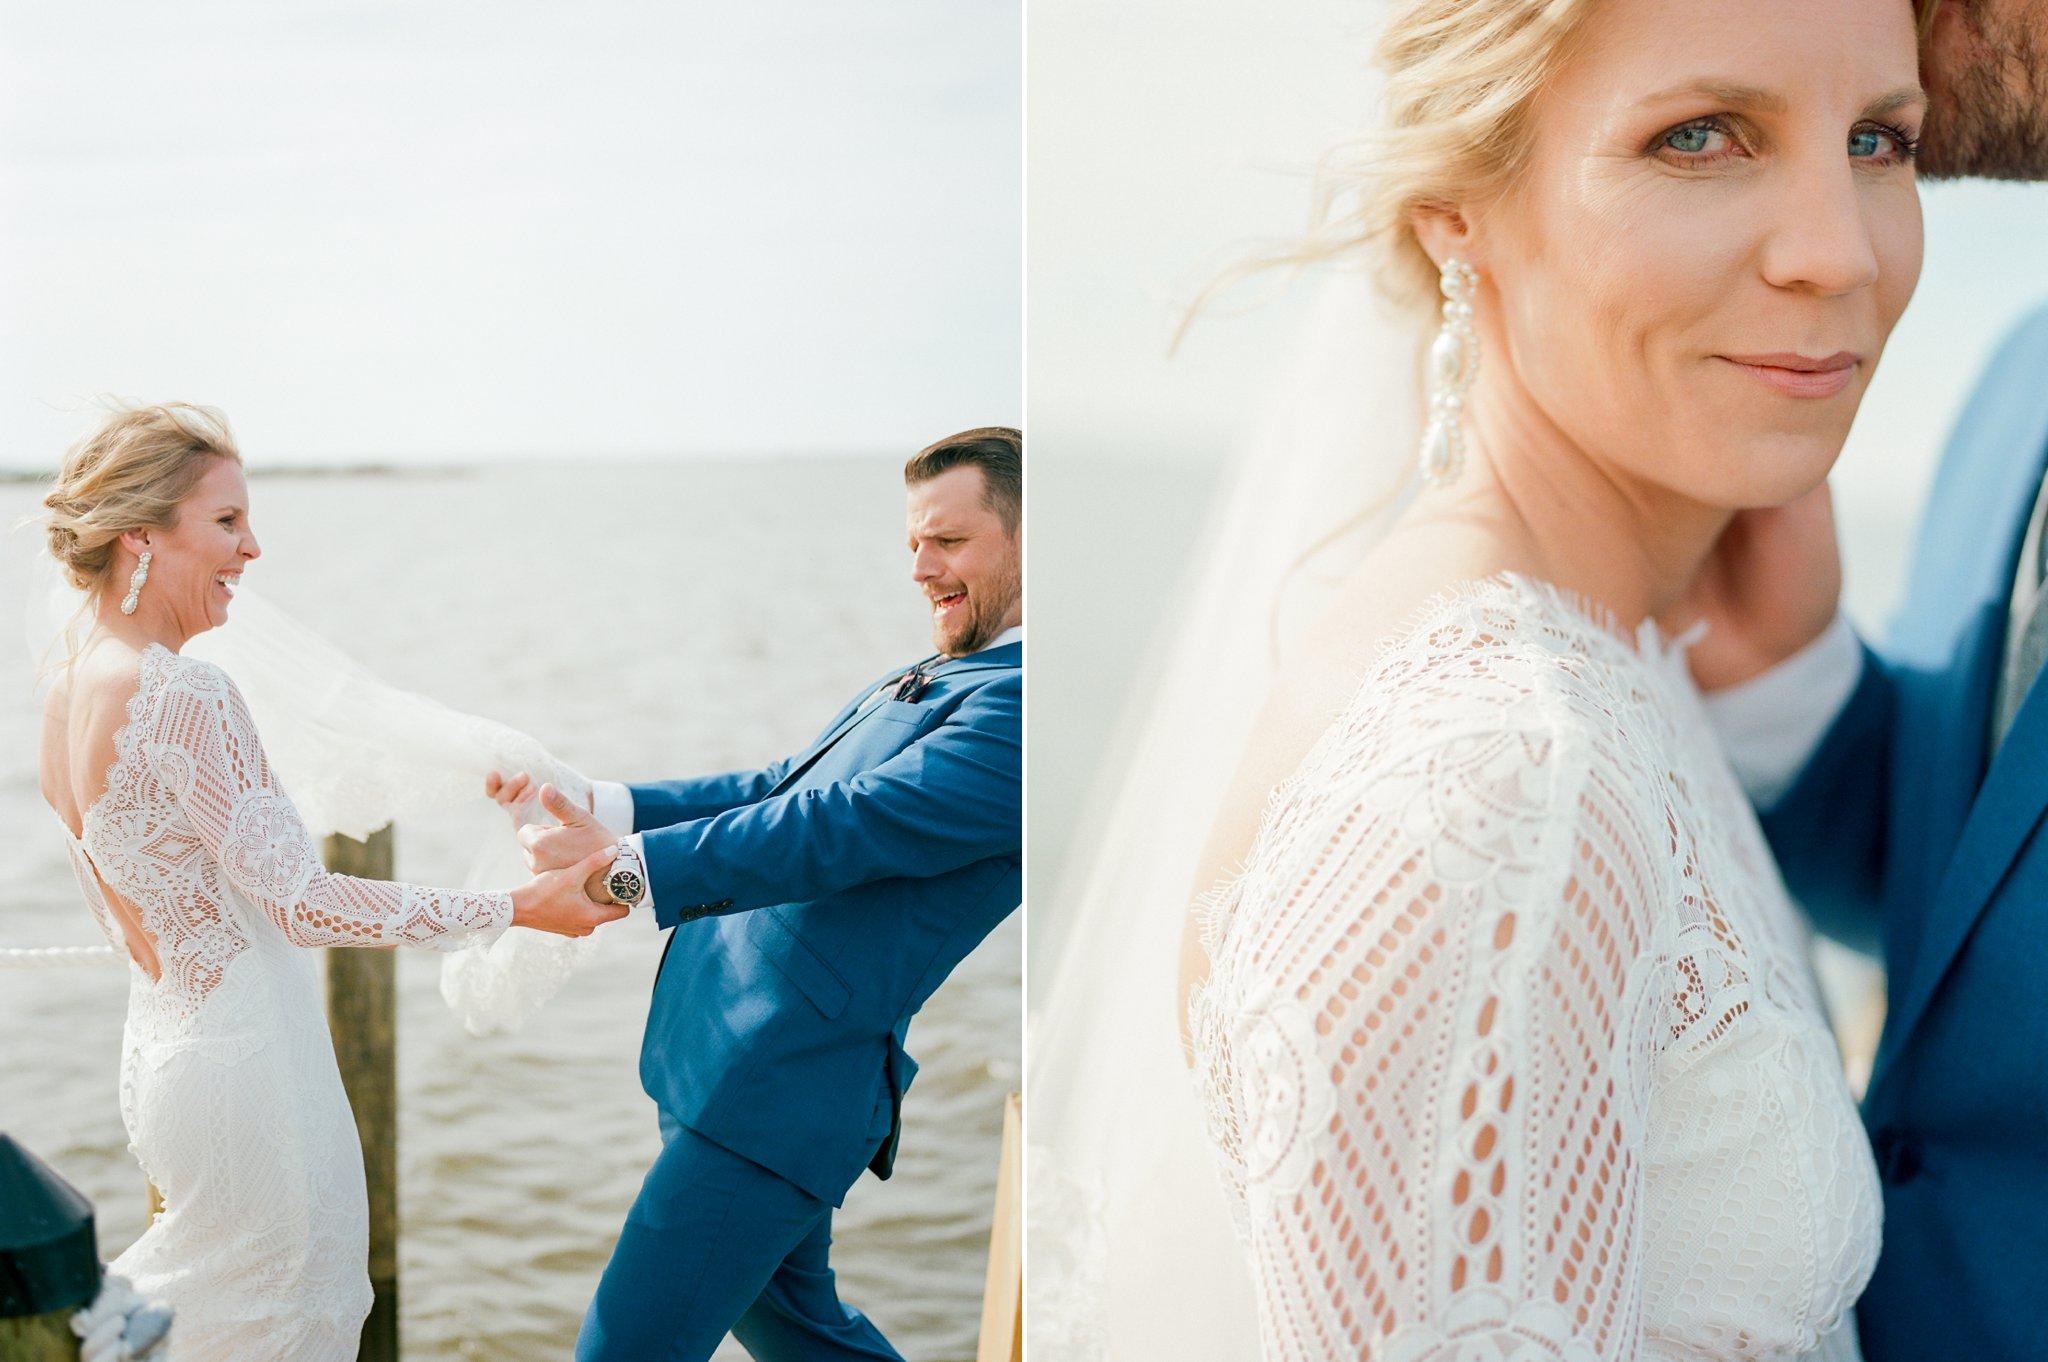 st+george+island+wedding+st+george+island+photographer+shannon+griffin+photography_0080.jpg